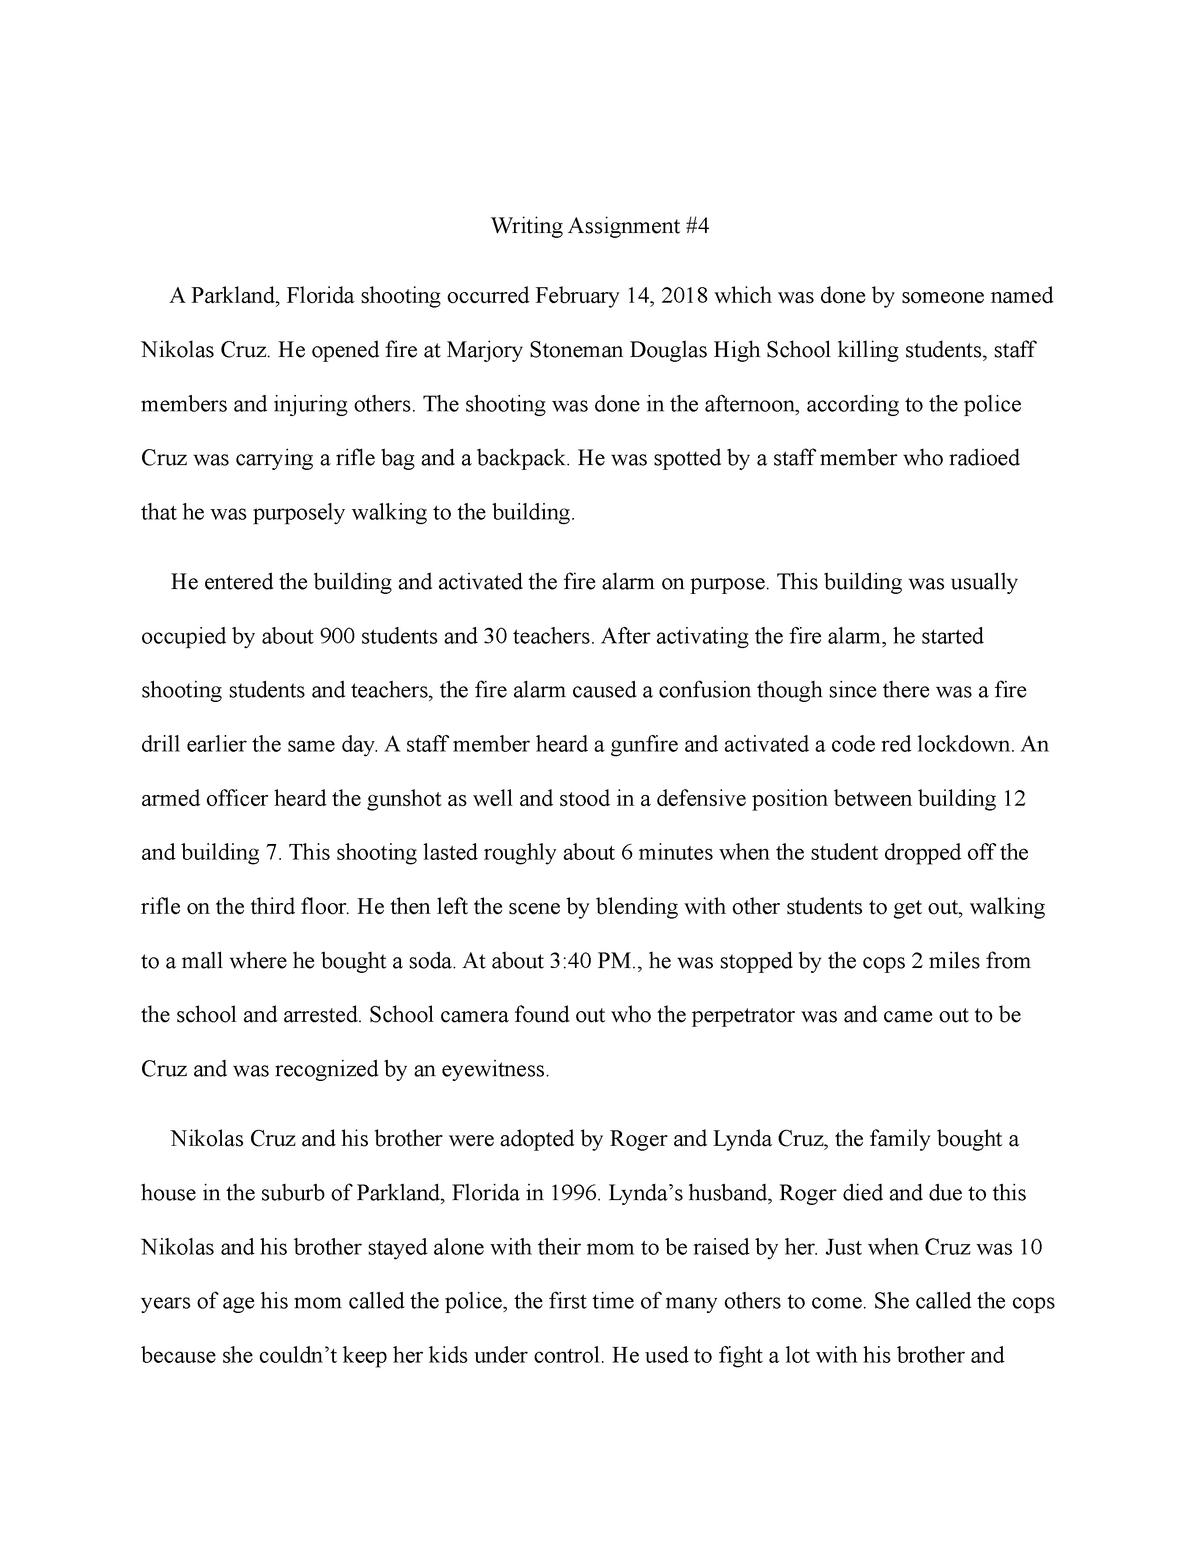 Essay on school shooting bertrand russell the value of philosophy essay